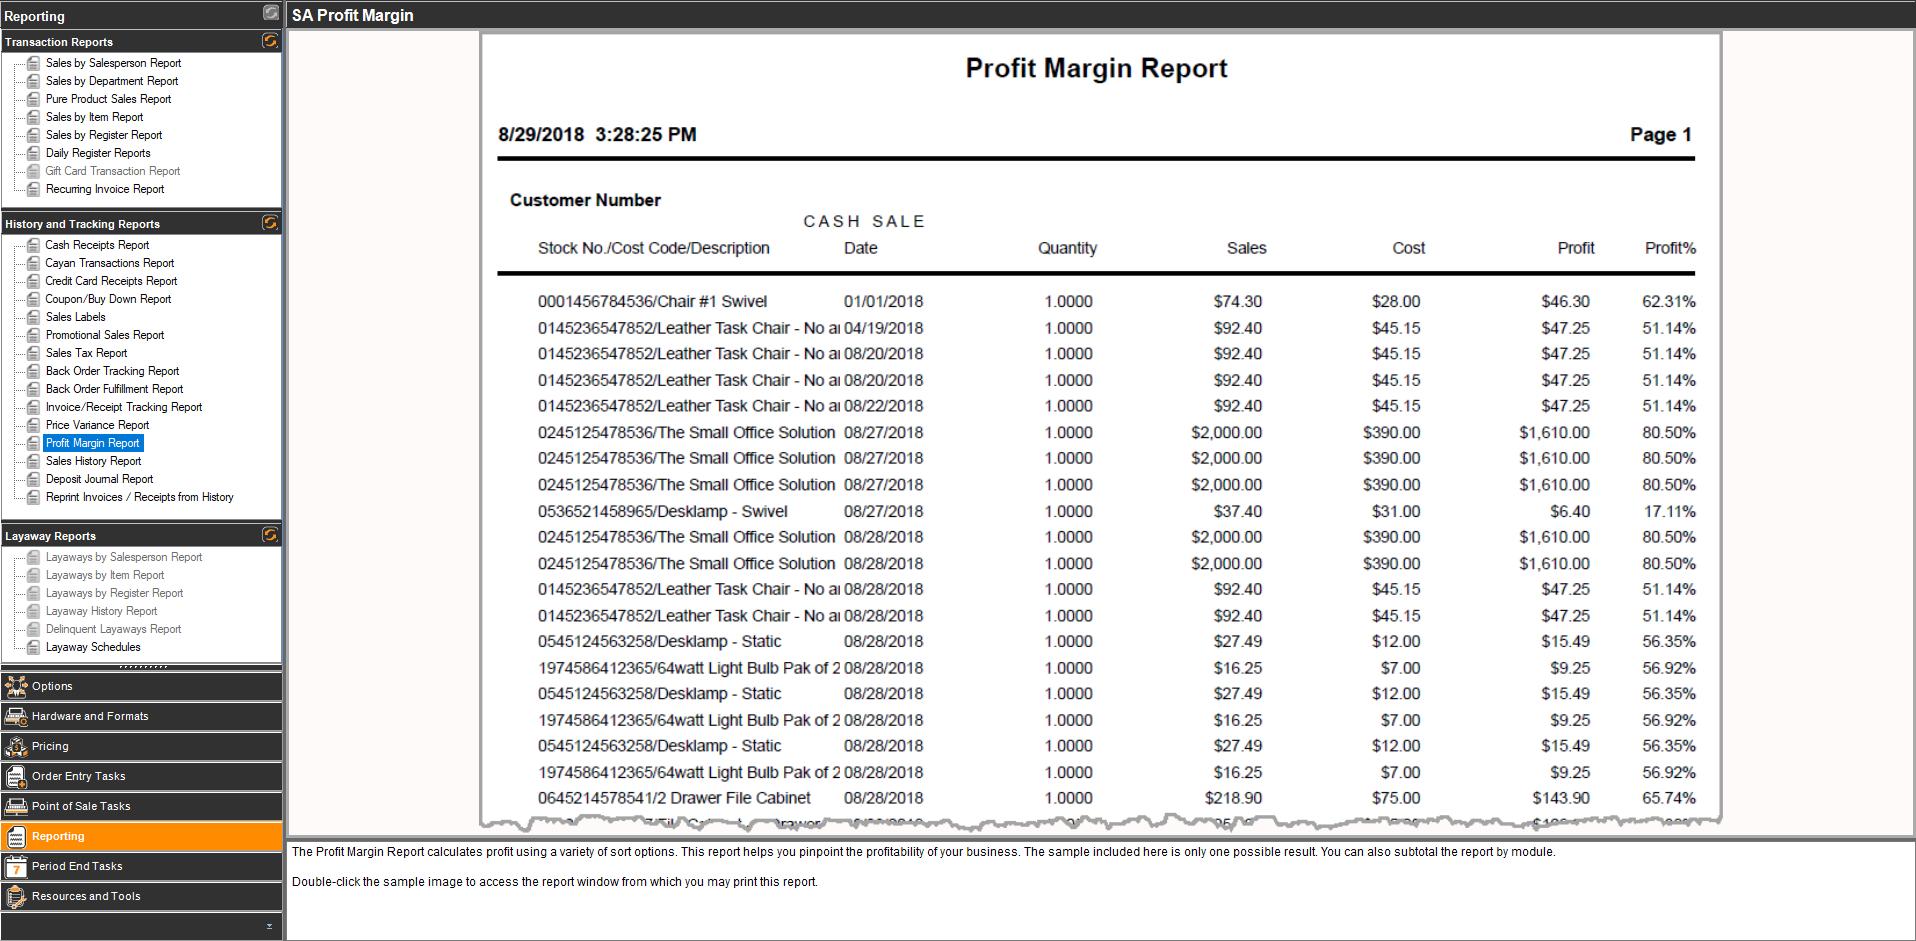 Denali Business Software - Sales Profit Margin Report